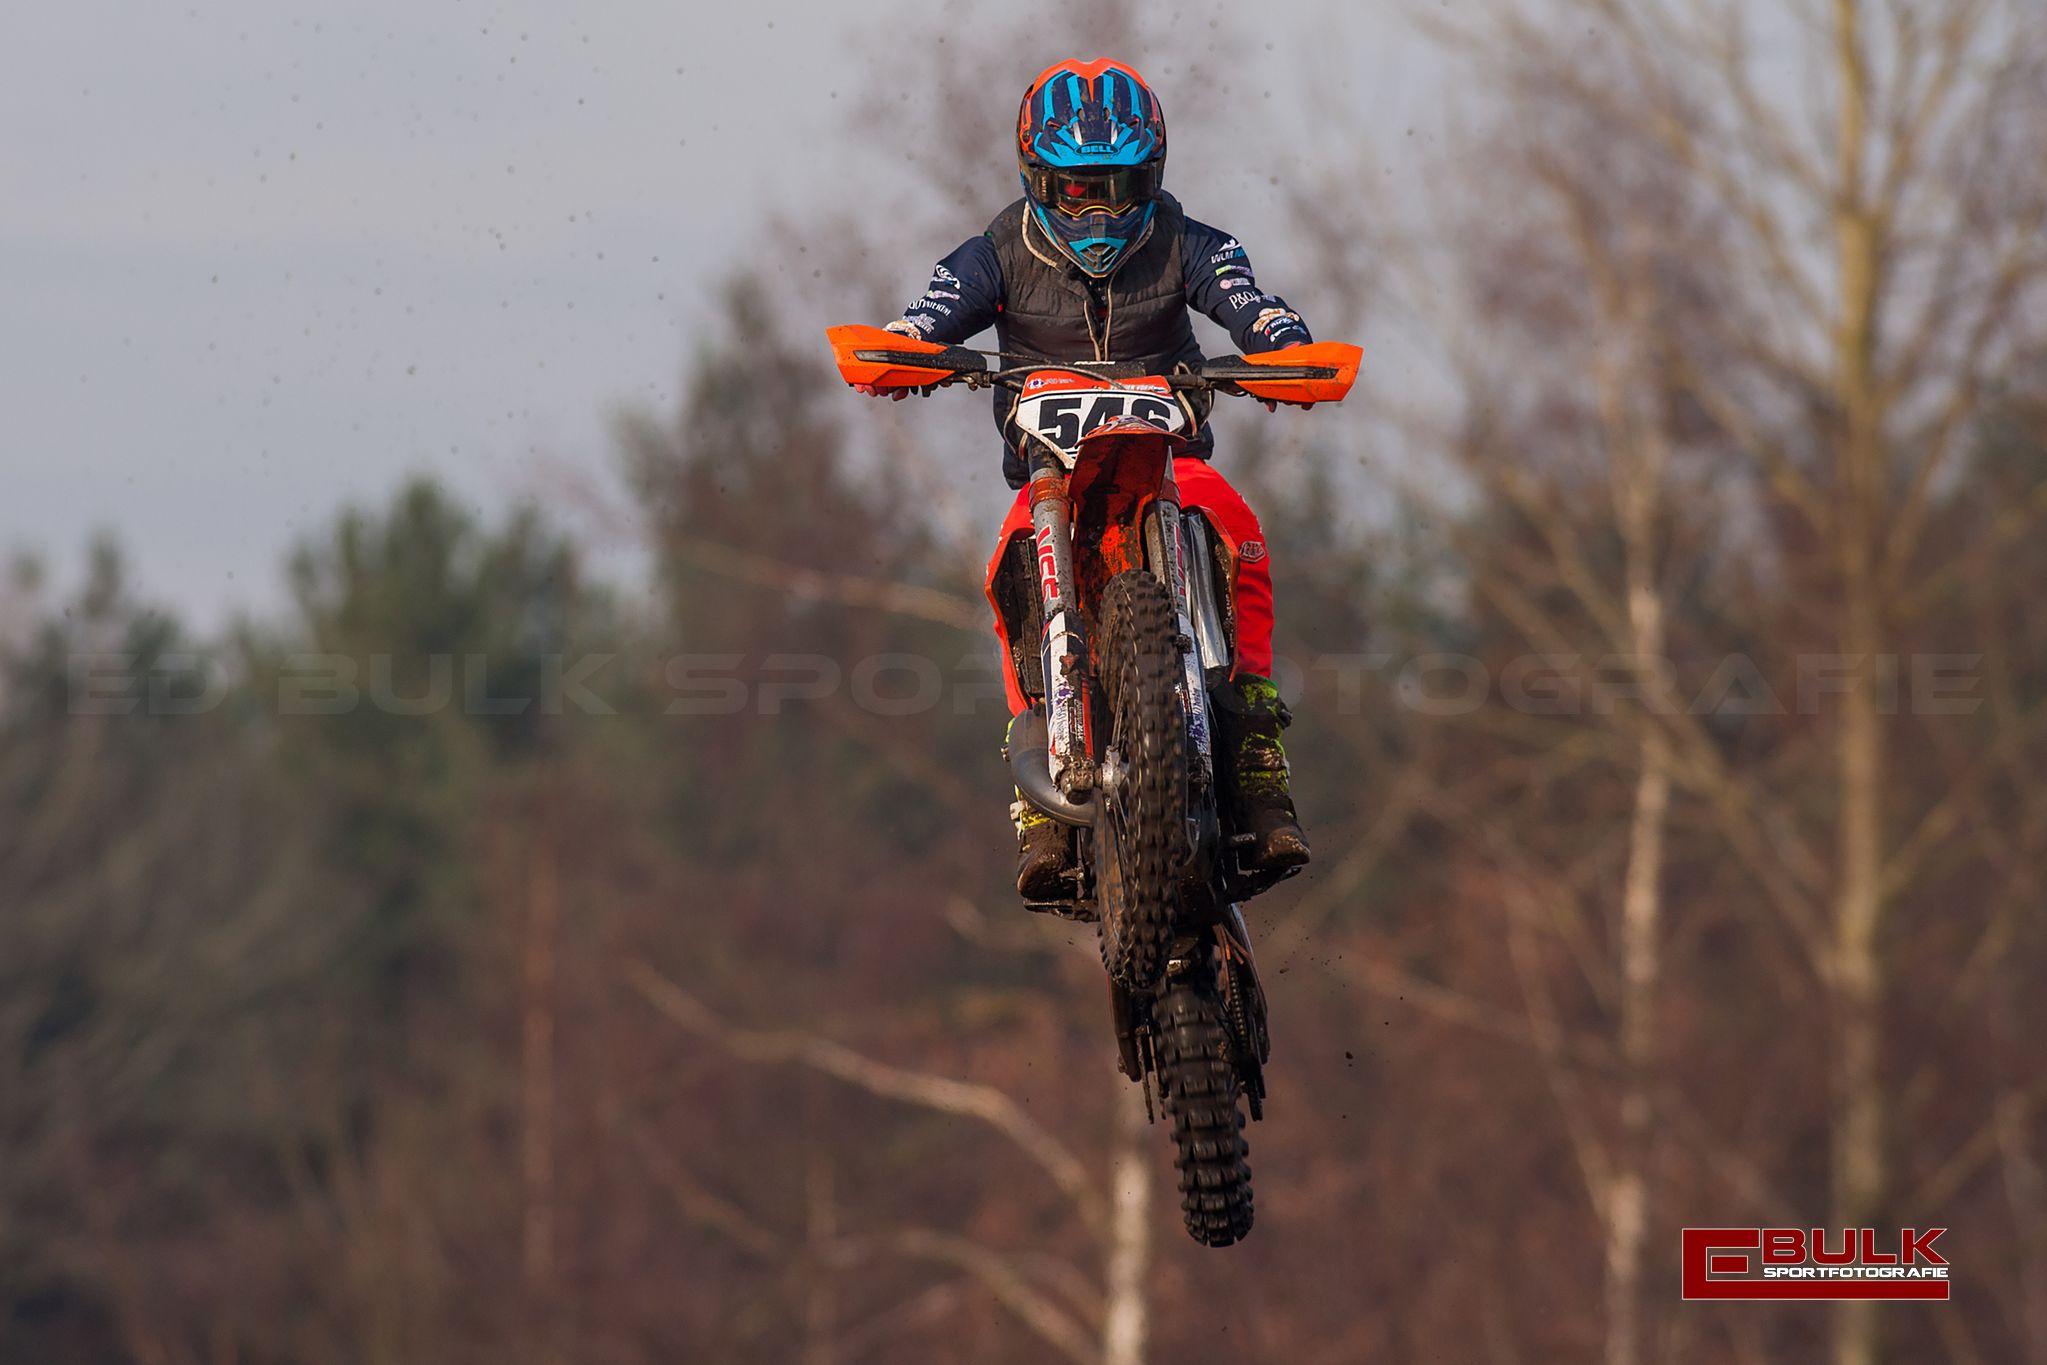 ebs_0498-ed_bulk_sportfotografie